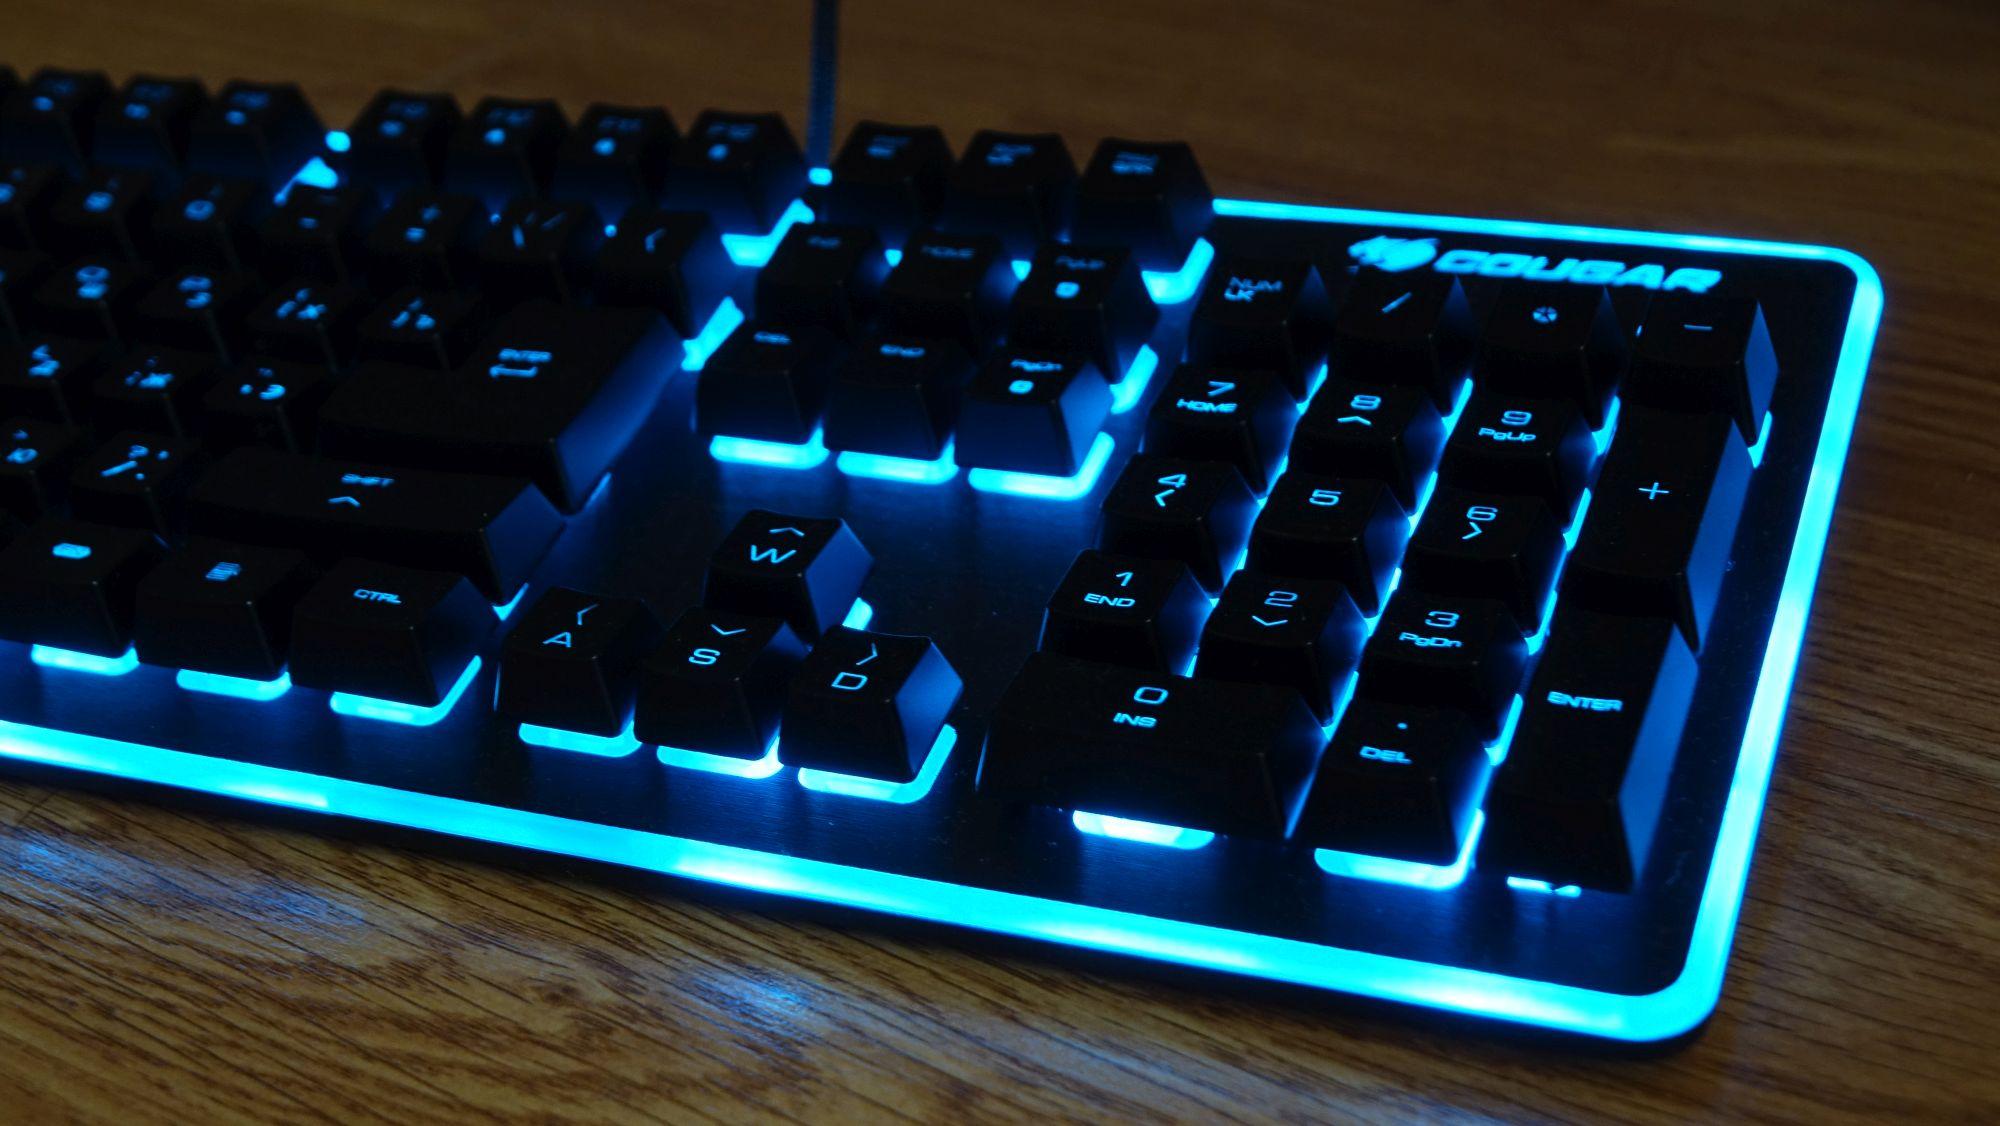 Cougar Deathfire EX переключатели клавиатуры